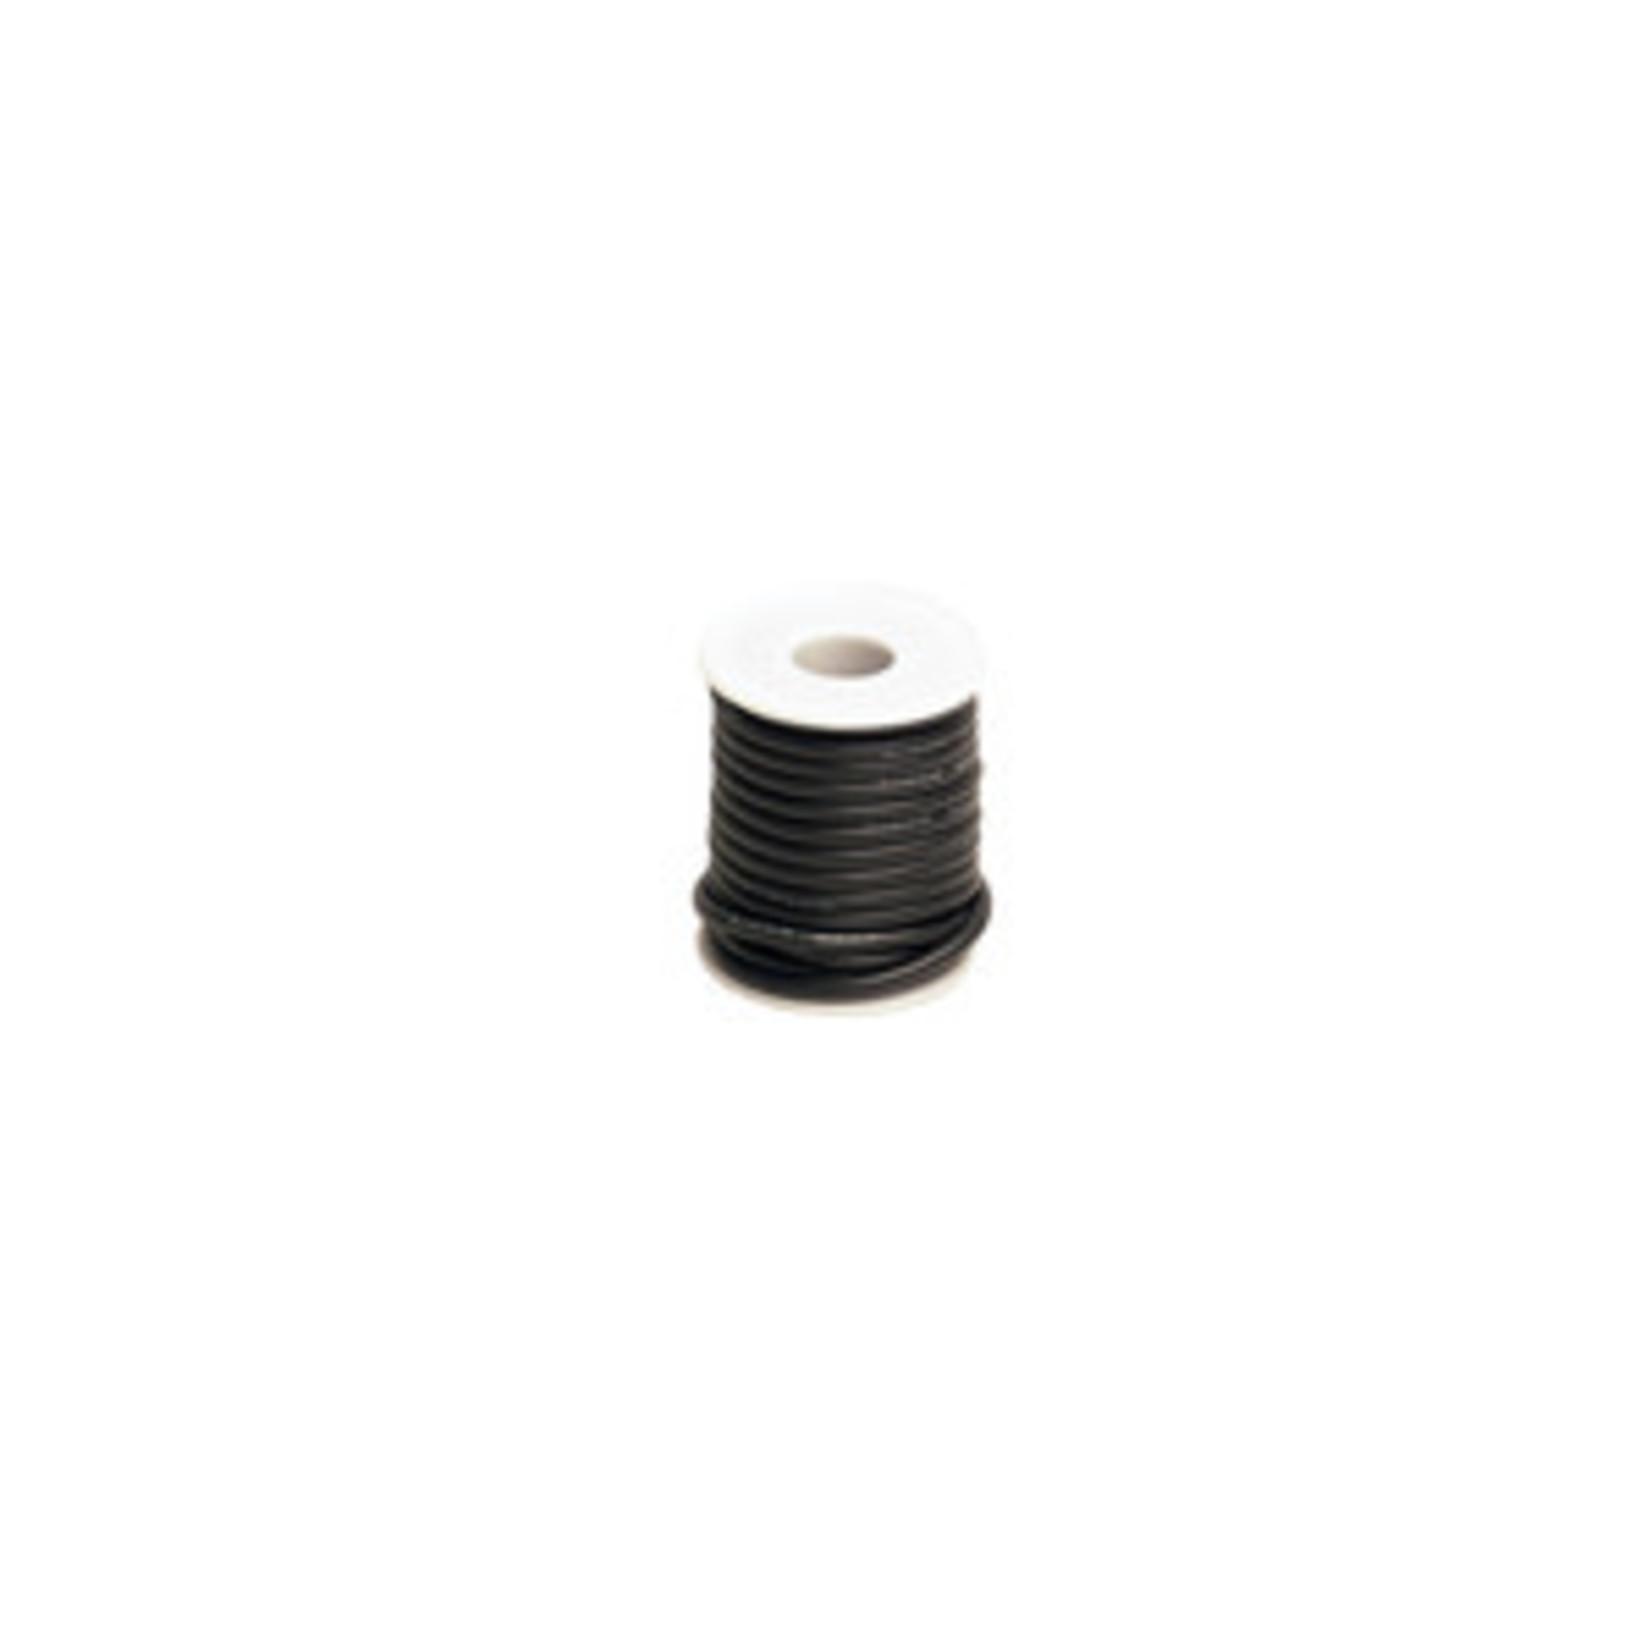 Racers Edge 12 Gauge Silicone Ultra-Flex Wire; 1 Feet (Black)